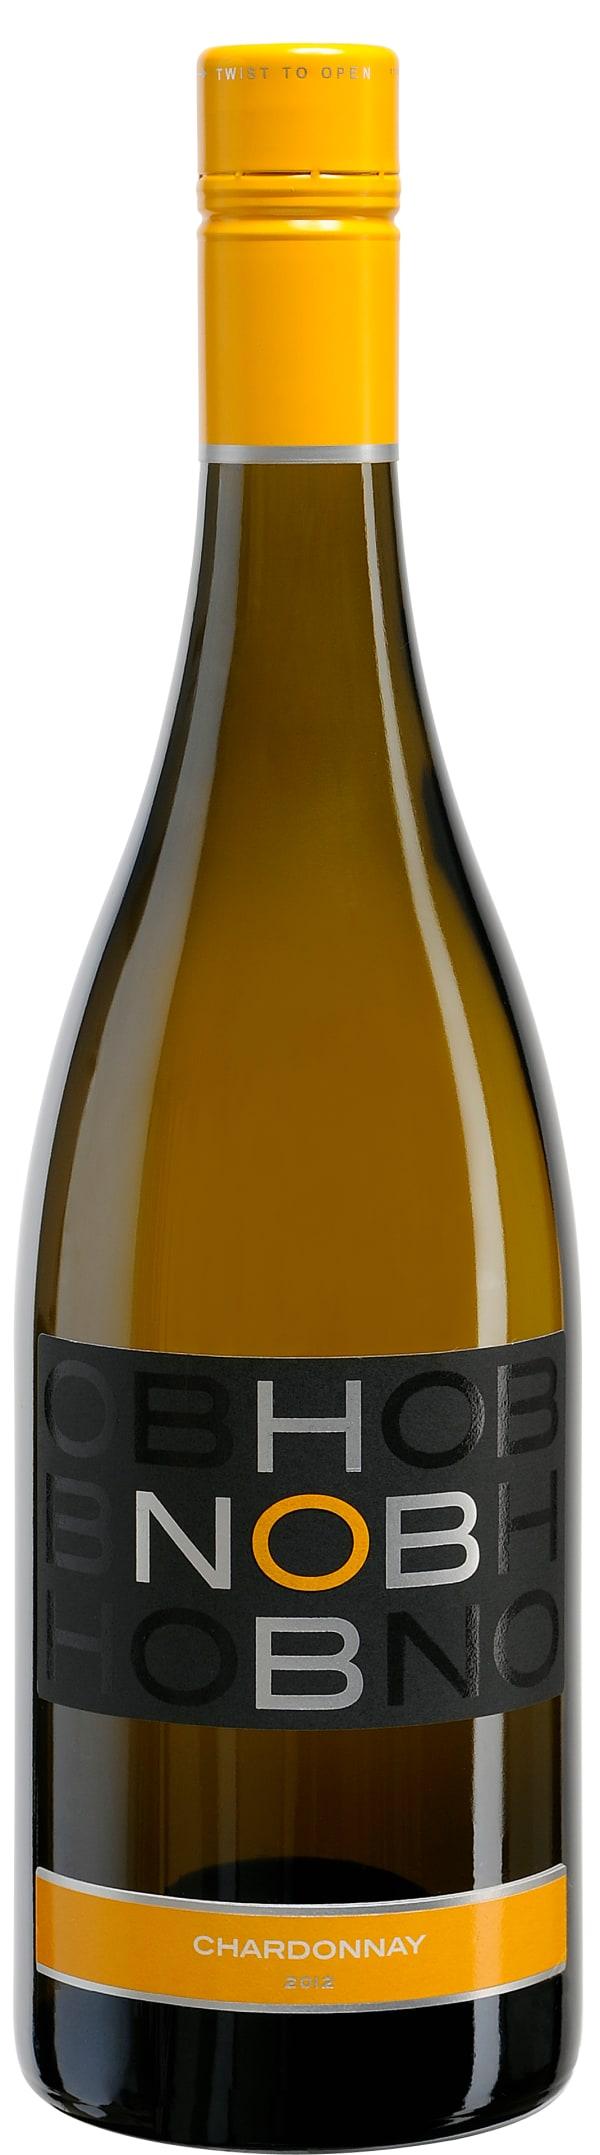 Hob Nob Chardonnay 2017